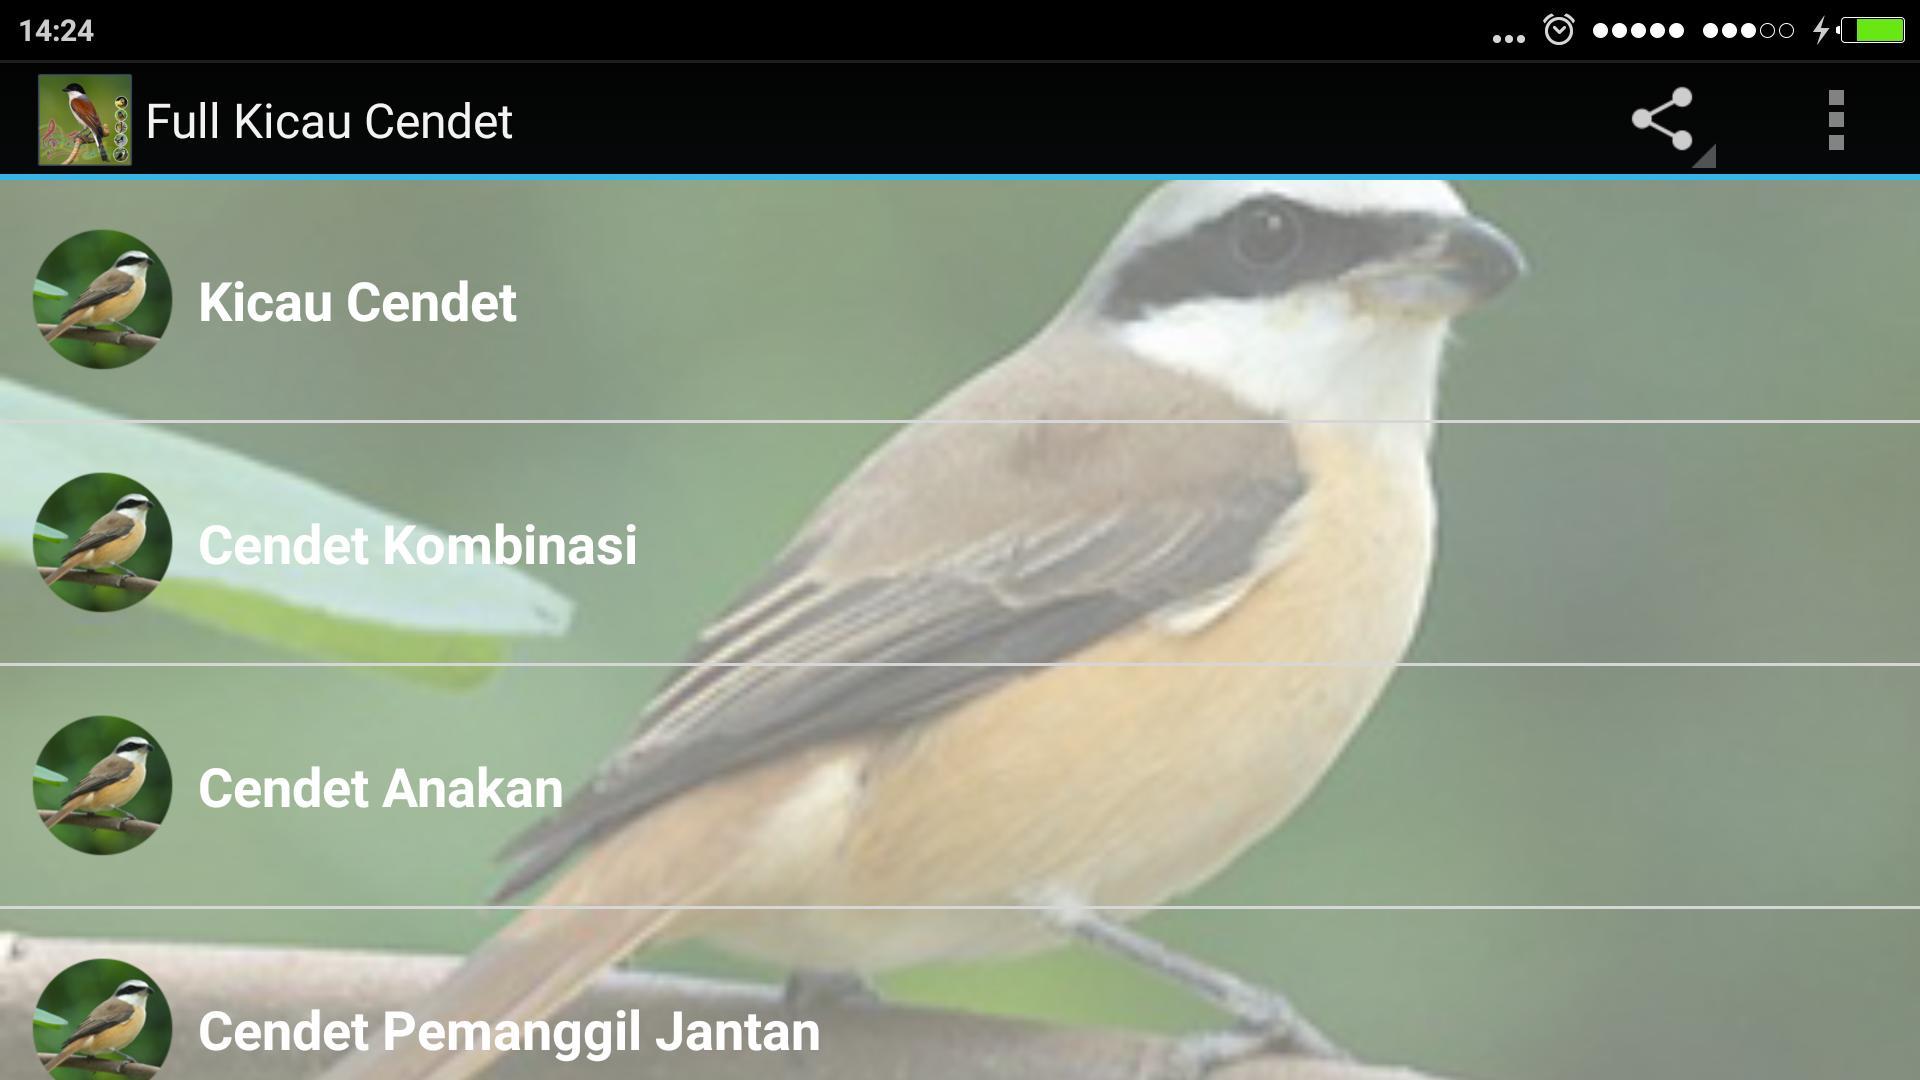 Full Kicau Burung Cendet For Android Apk Download